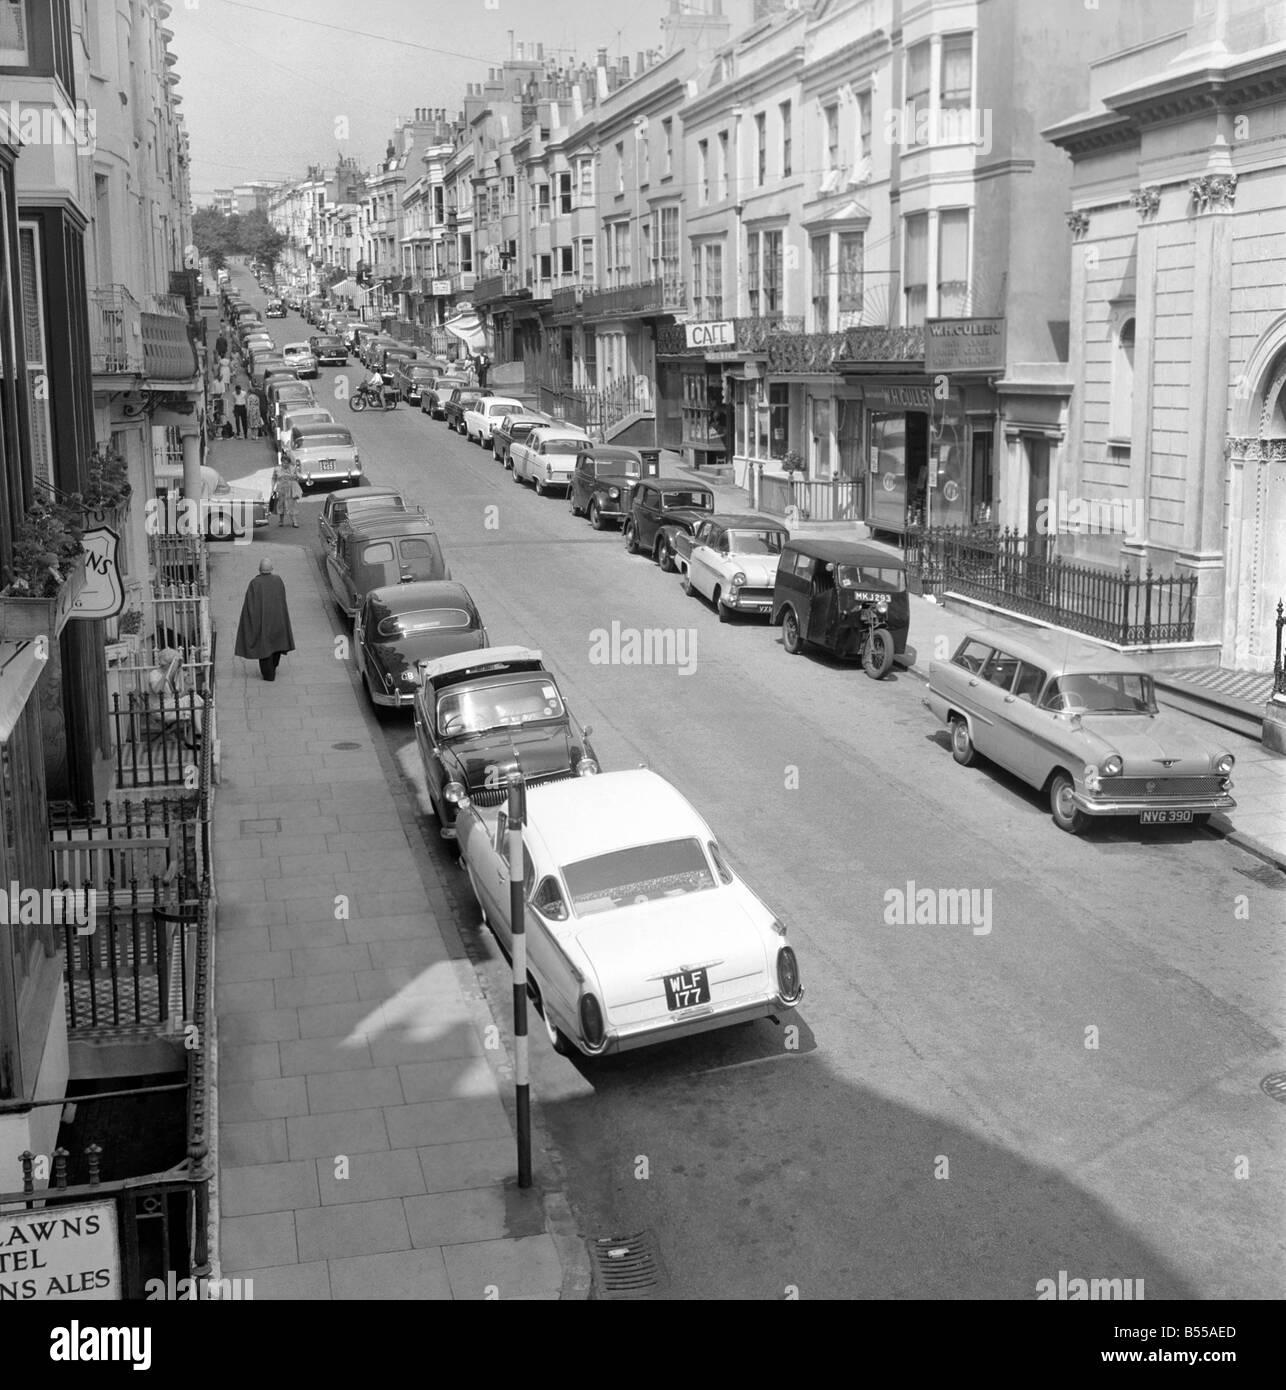 Traffic/Parked cars, street scene. June 1960 M4336 - Stock Image